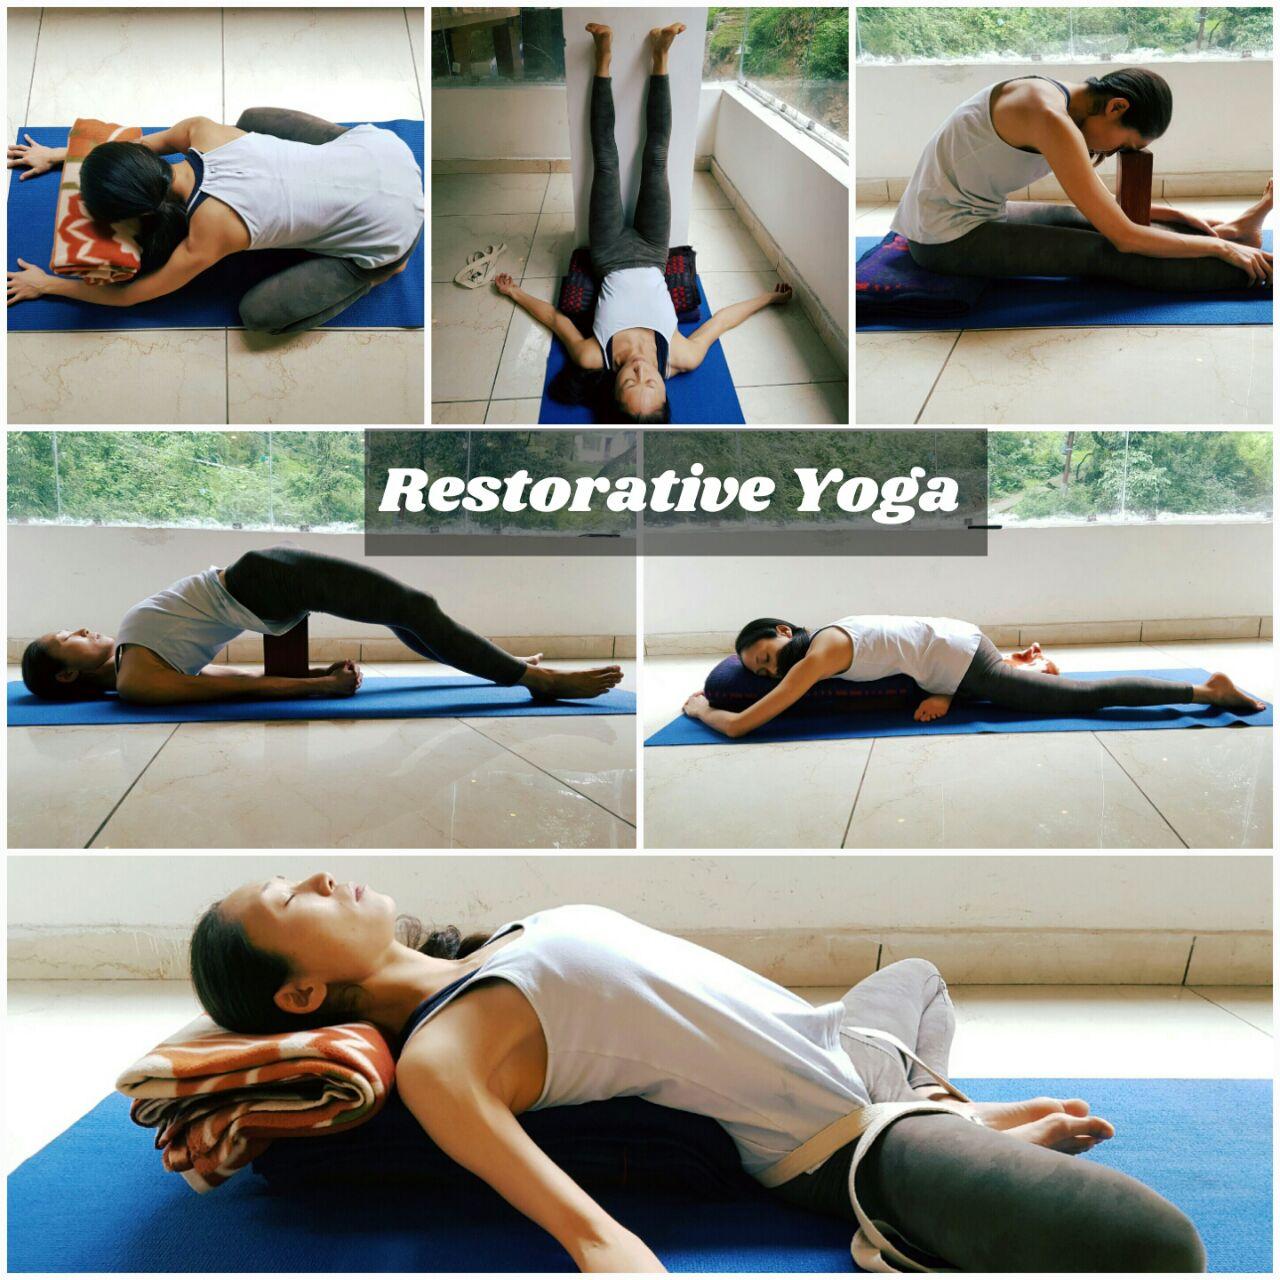 Restorative Yoga - Asanyoga